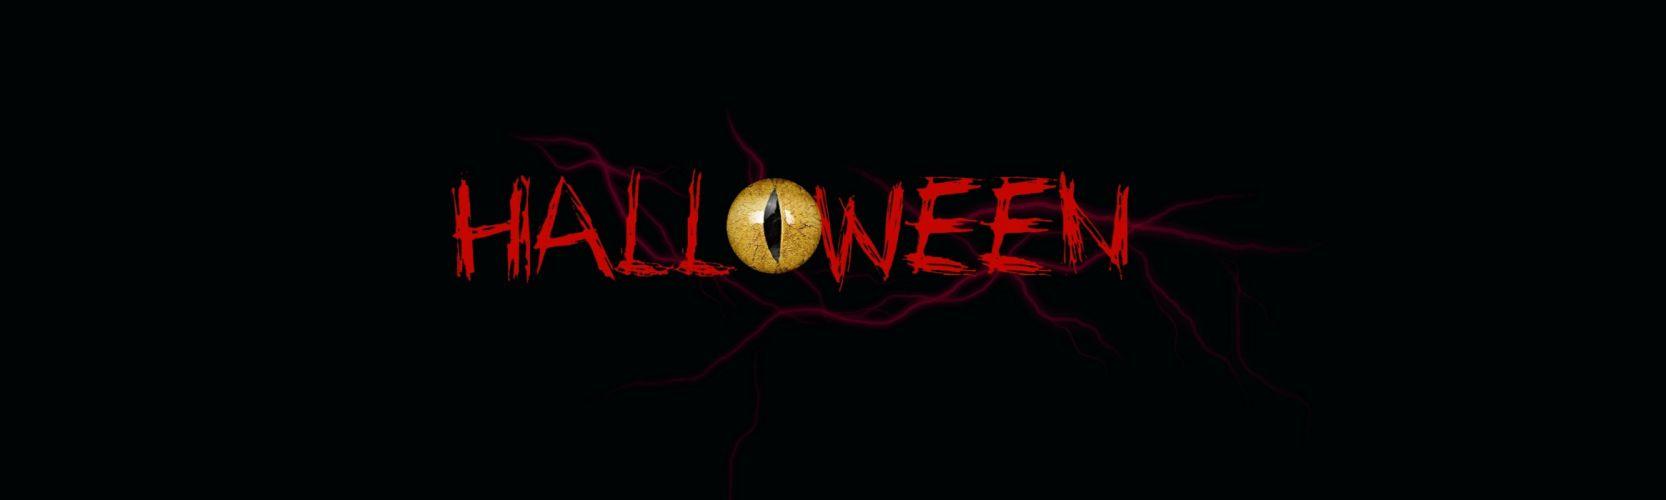 Banner Header Homepage Halloween Creepy Scary wallpaper